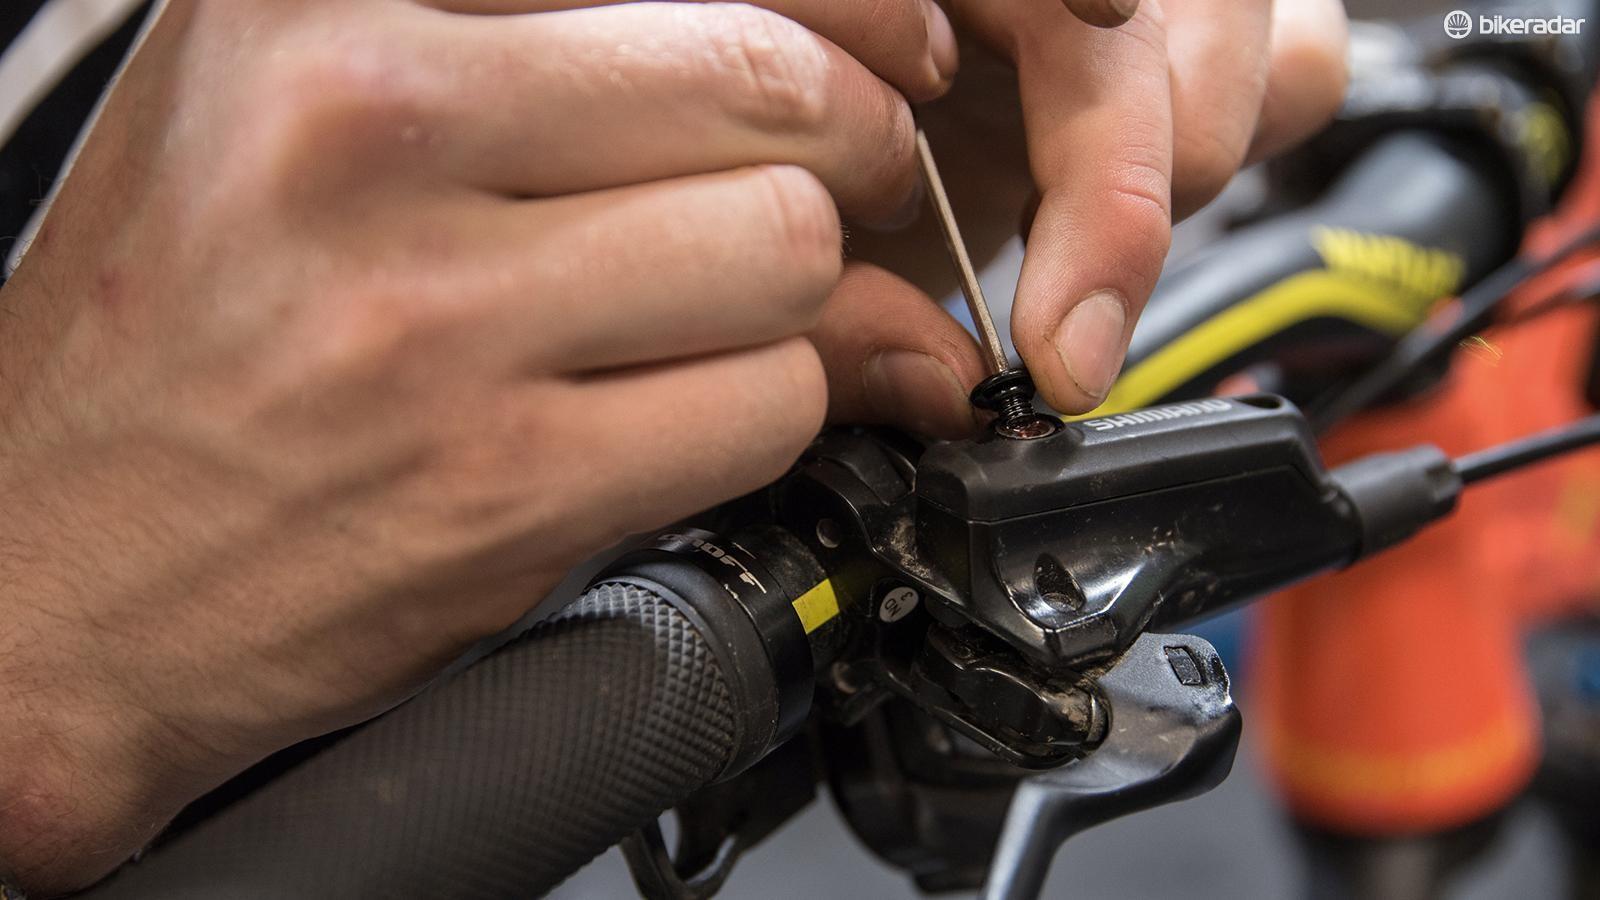 tips-for-bleeding-shimano-brake-07-1519948261070-dw9djhtmhjkd-1535015236465-pyicruhob9ne-1ba35f5